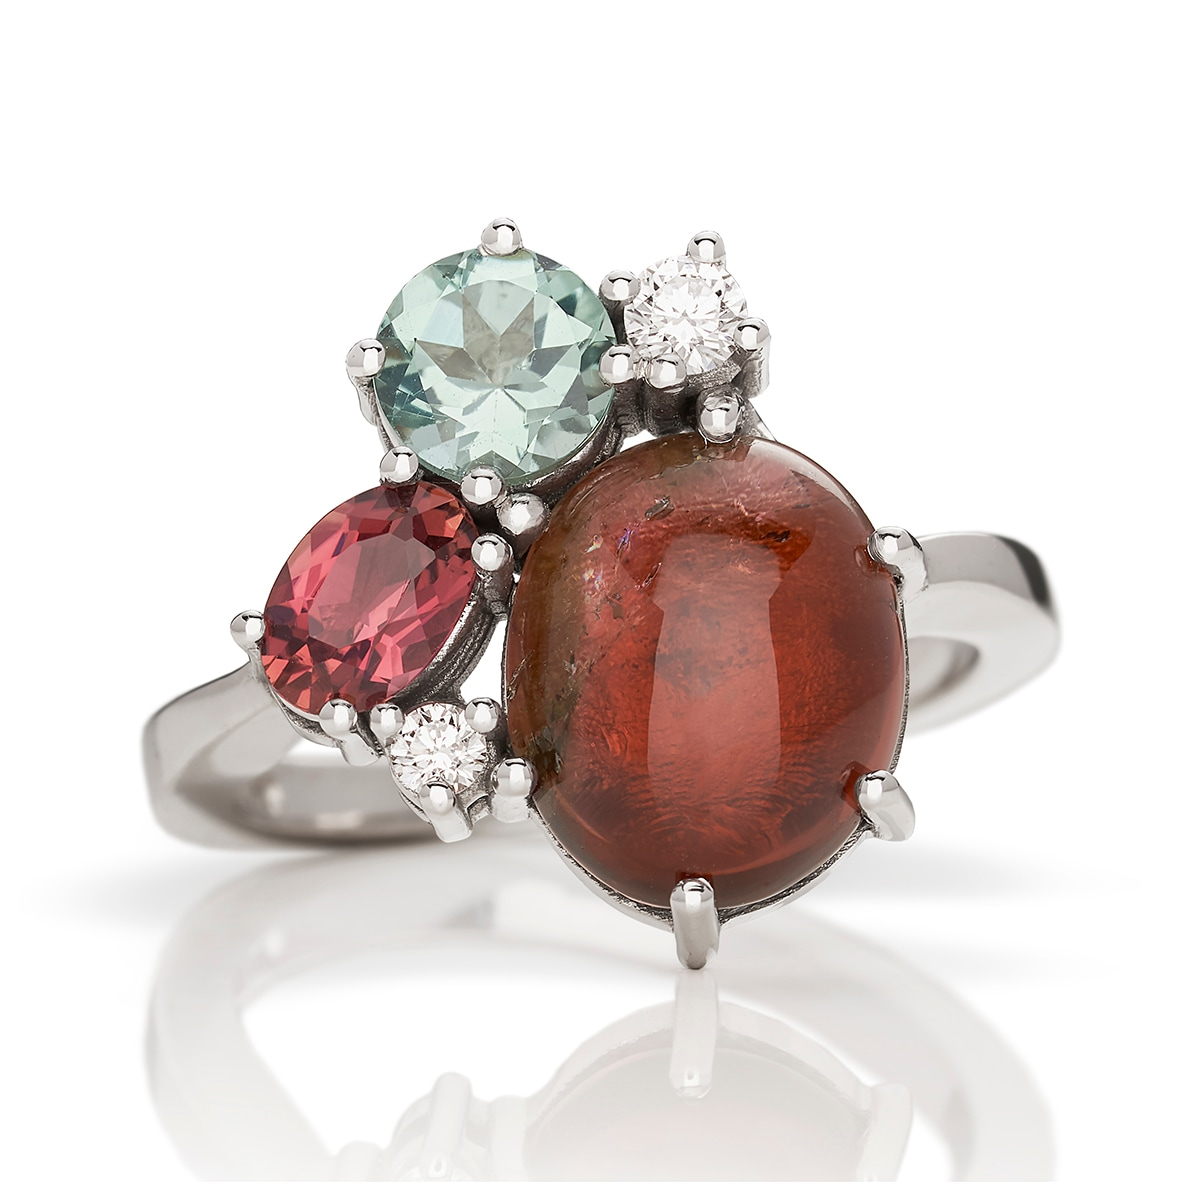 Sandin_1956_Potpourri_VG_Turmalinerx3+diamant_hos_Jarl_Sandin